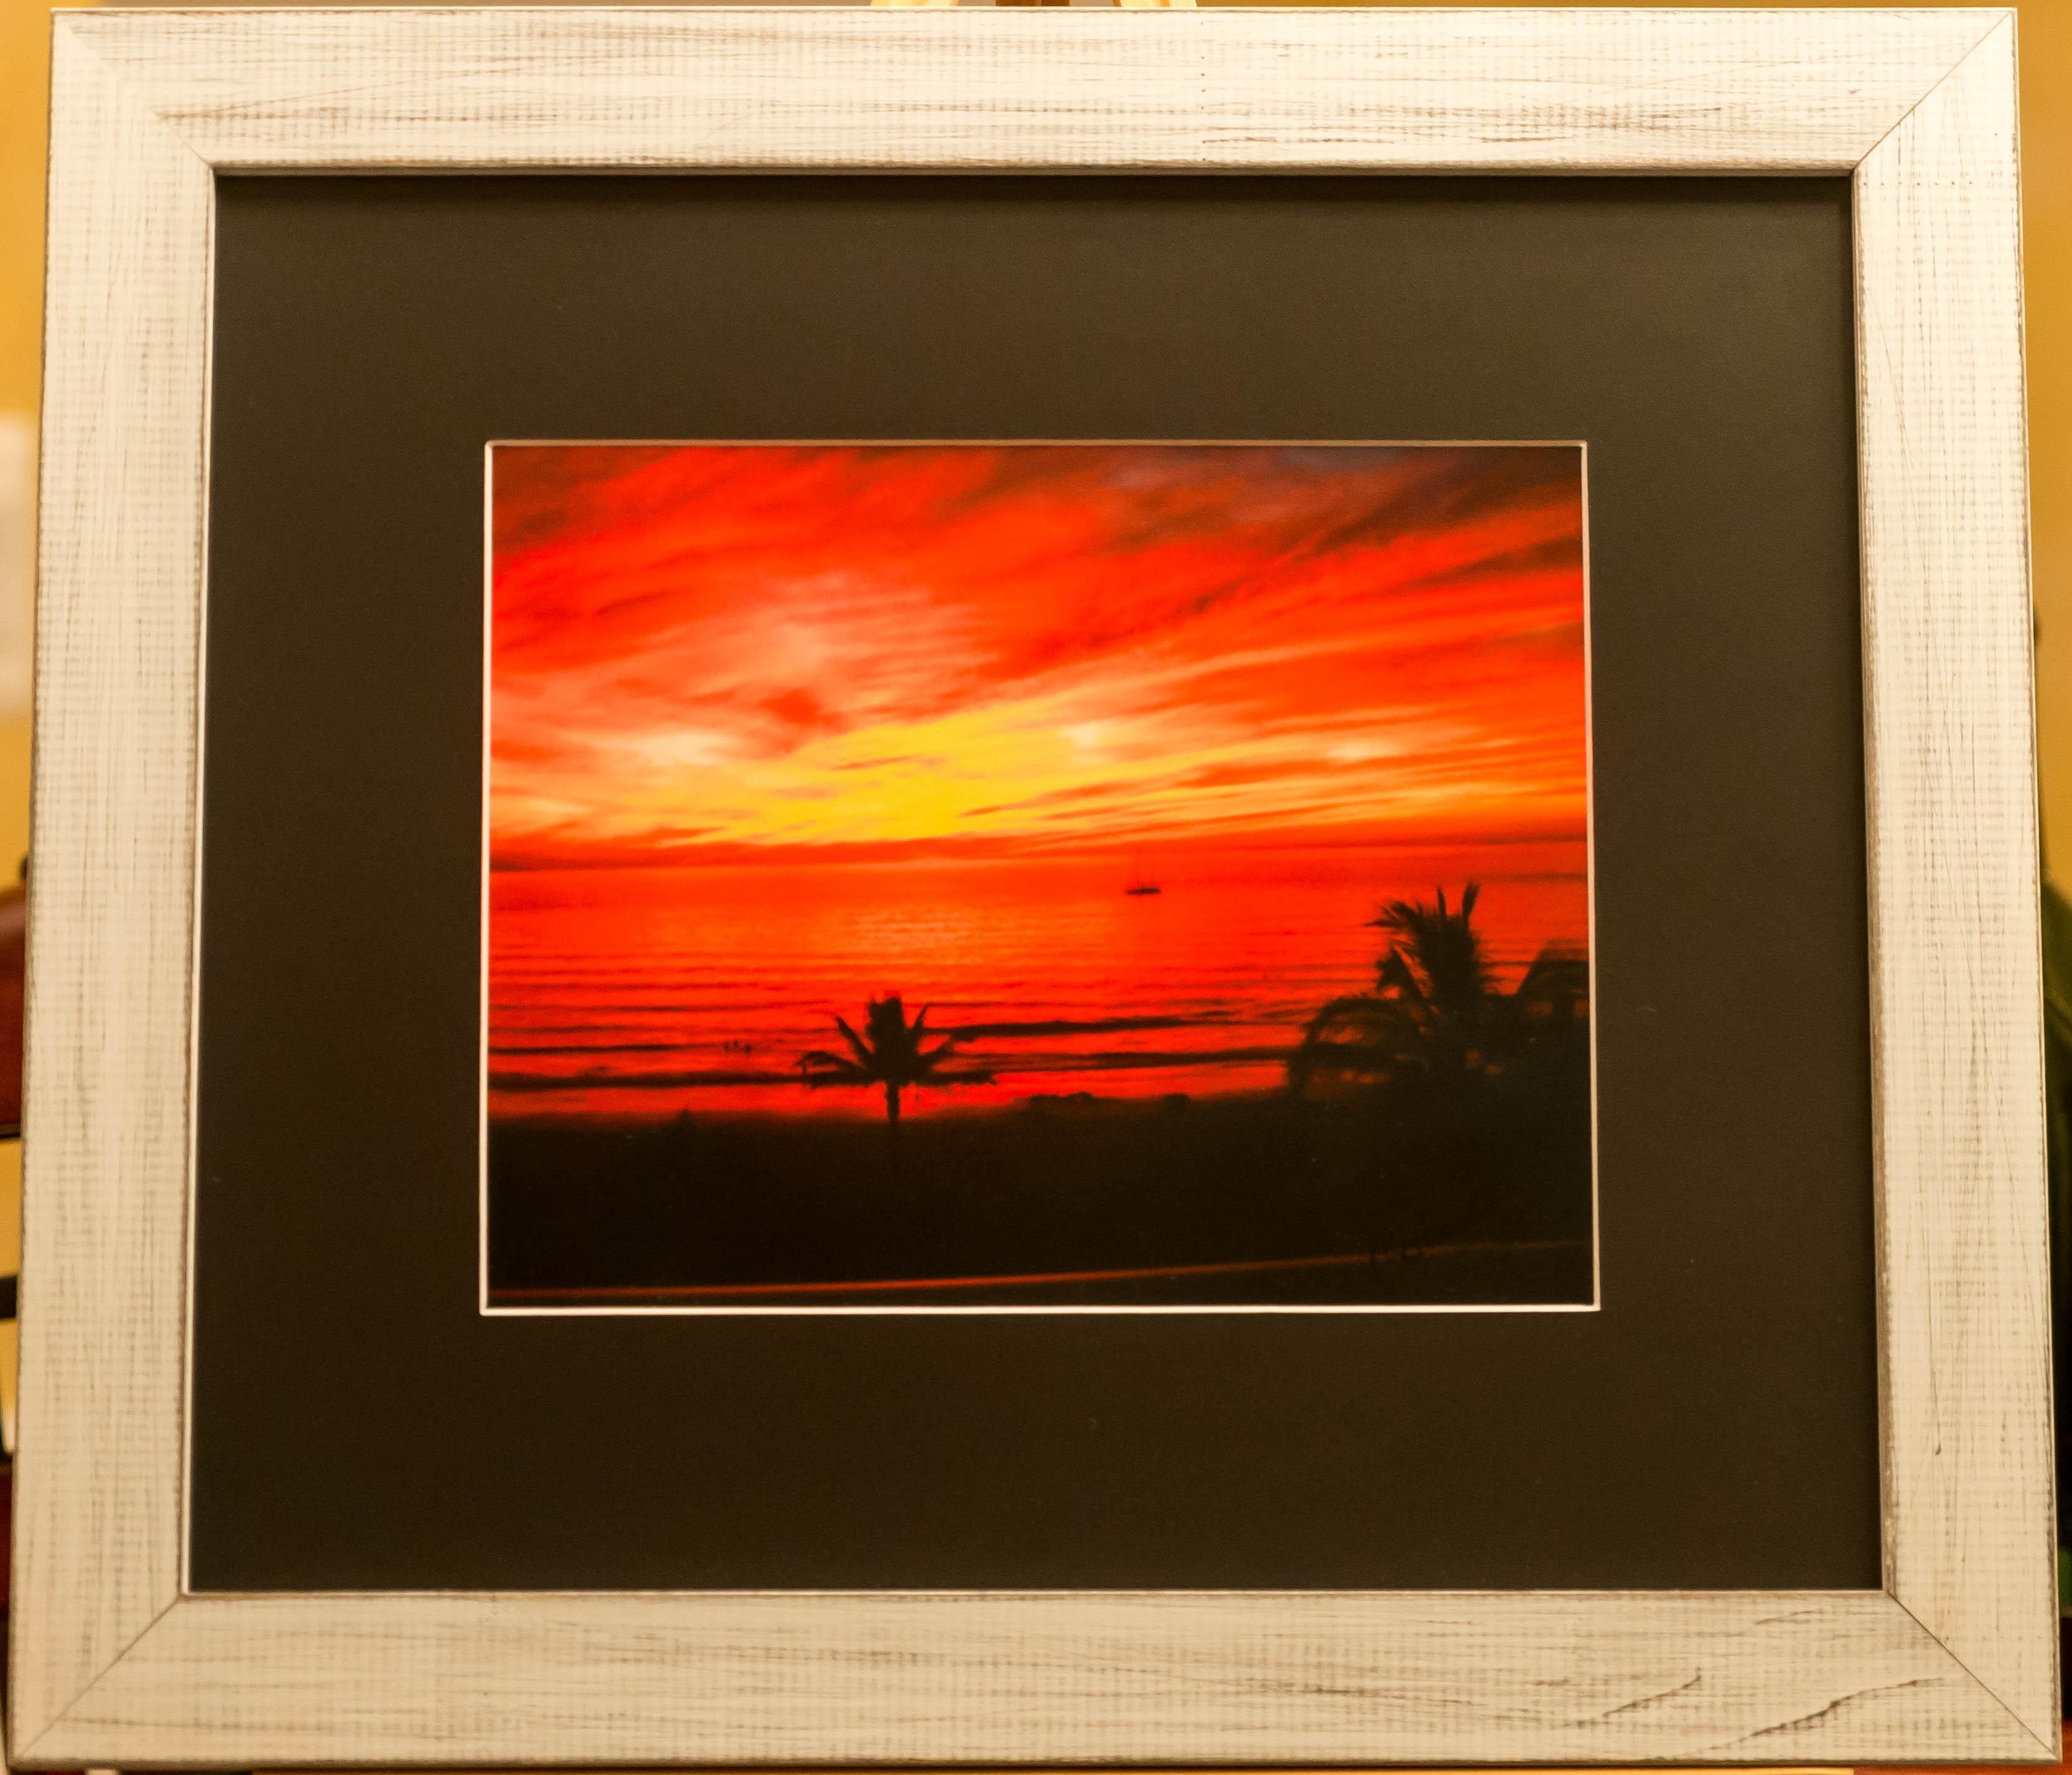 082315 Sunsets-2.jpg